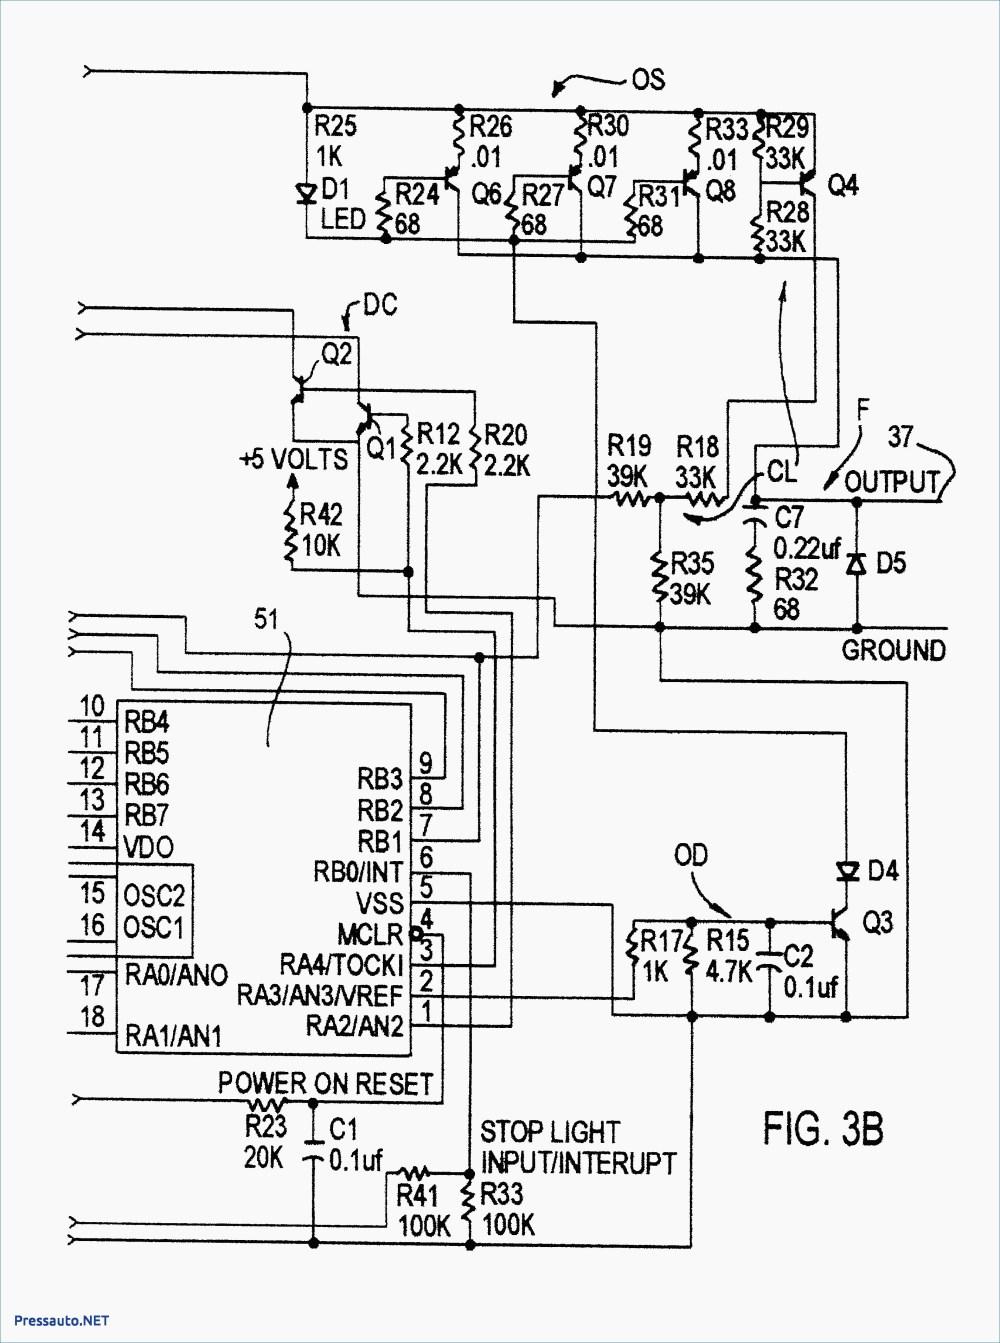 medium resolution of 4 wire mobile home wiring diagram unique wiring diagram image rh mainetreasurechest com automotive wiring diagrams